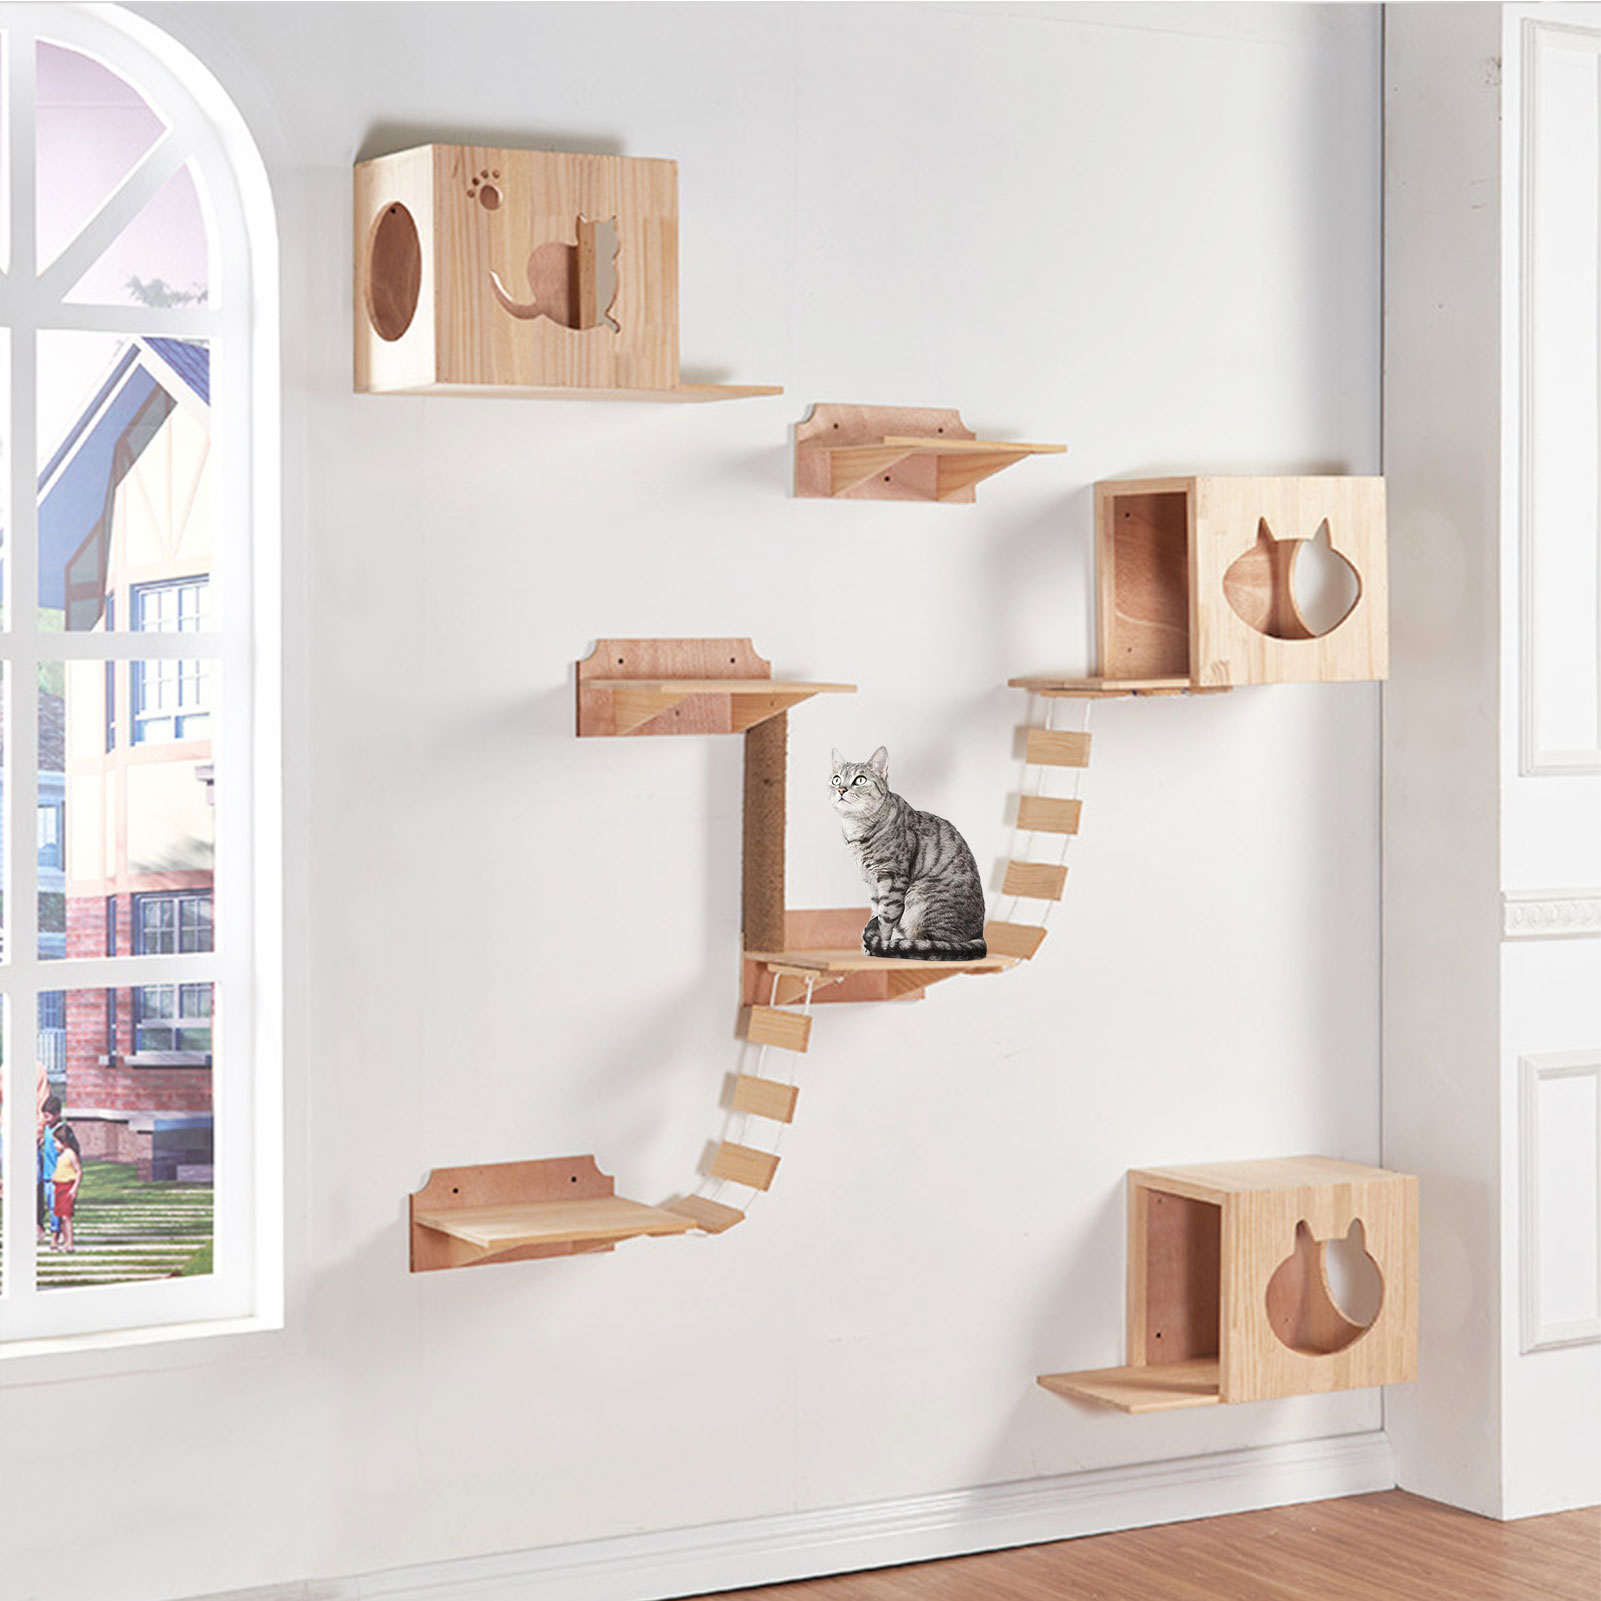 Cat Bridge Climbing Frame Wood Pet Cat Tree House Bed Hammock Sisal Scratching Post Cat Furniture Cat Toy Wall Mounted